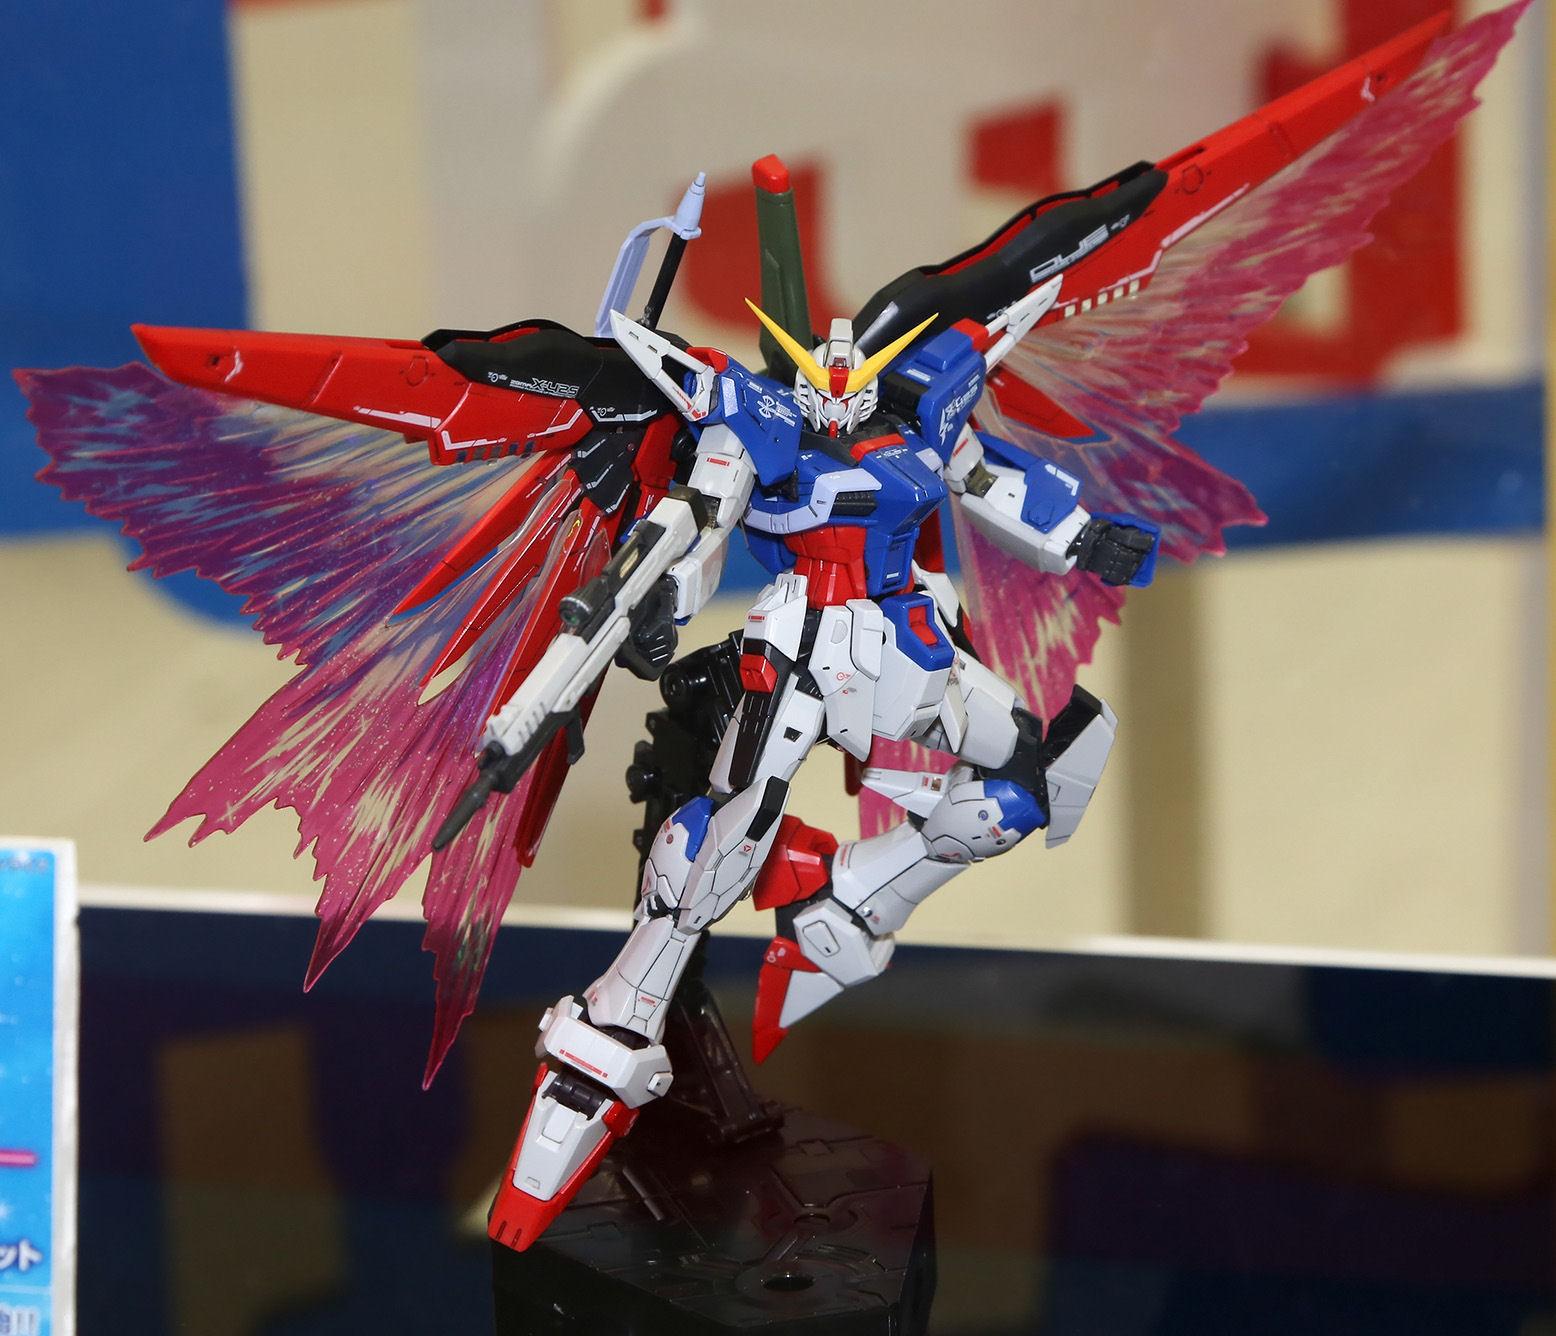 "[Premium Bandai] Expansion Effect Unit ""Wings of Light"" 光の翼 x RG 1/144 Destiny Gundam RG 1/144 デスティニーガンダム用 拡張エフェクトユニット""光の翼"""